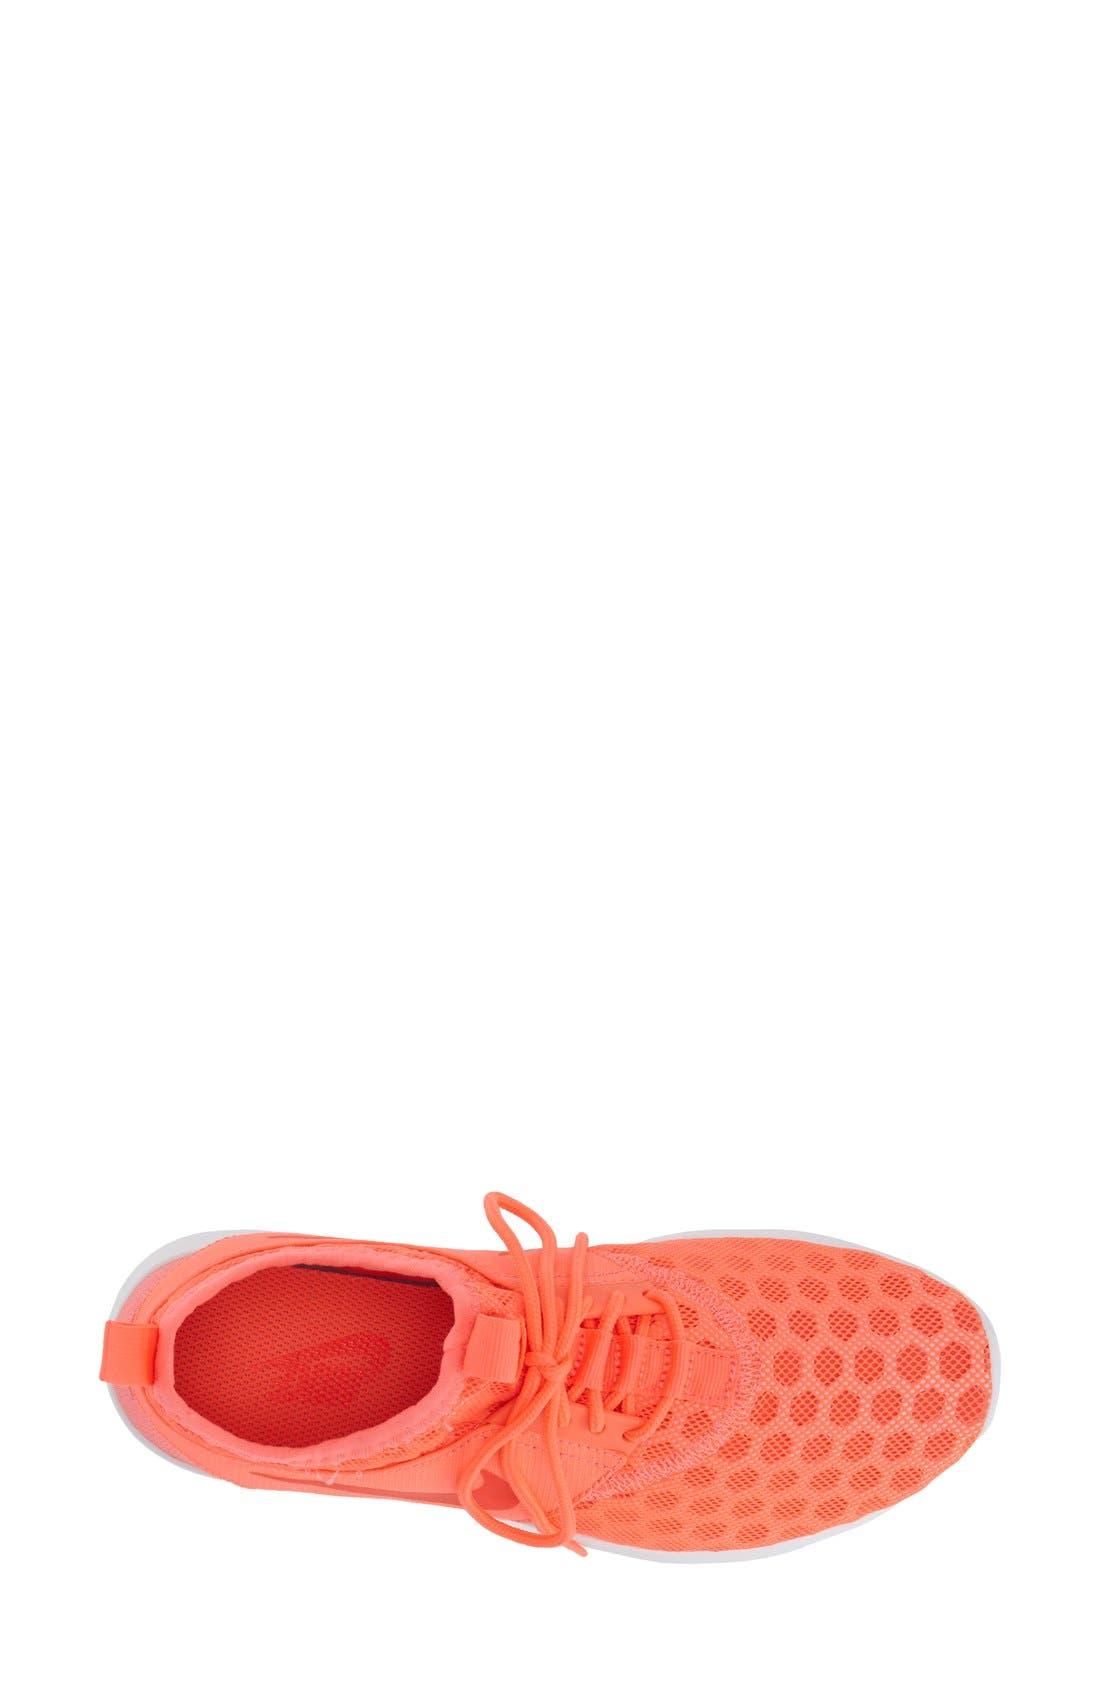 Juvenate Sneaker,                             Alternate thumbnail 159, color,